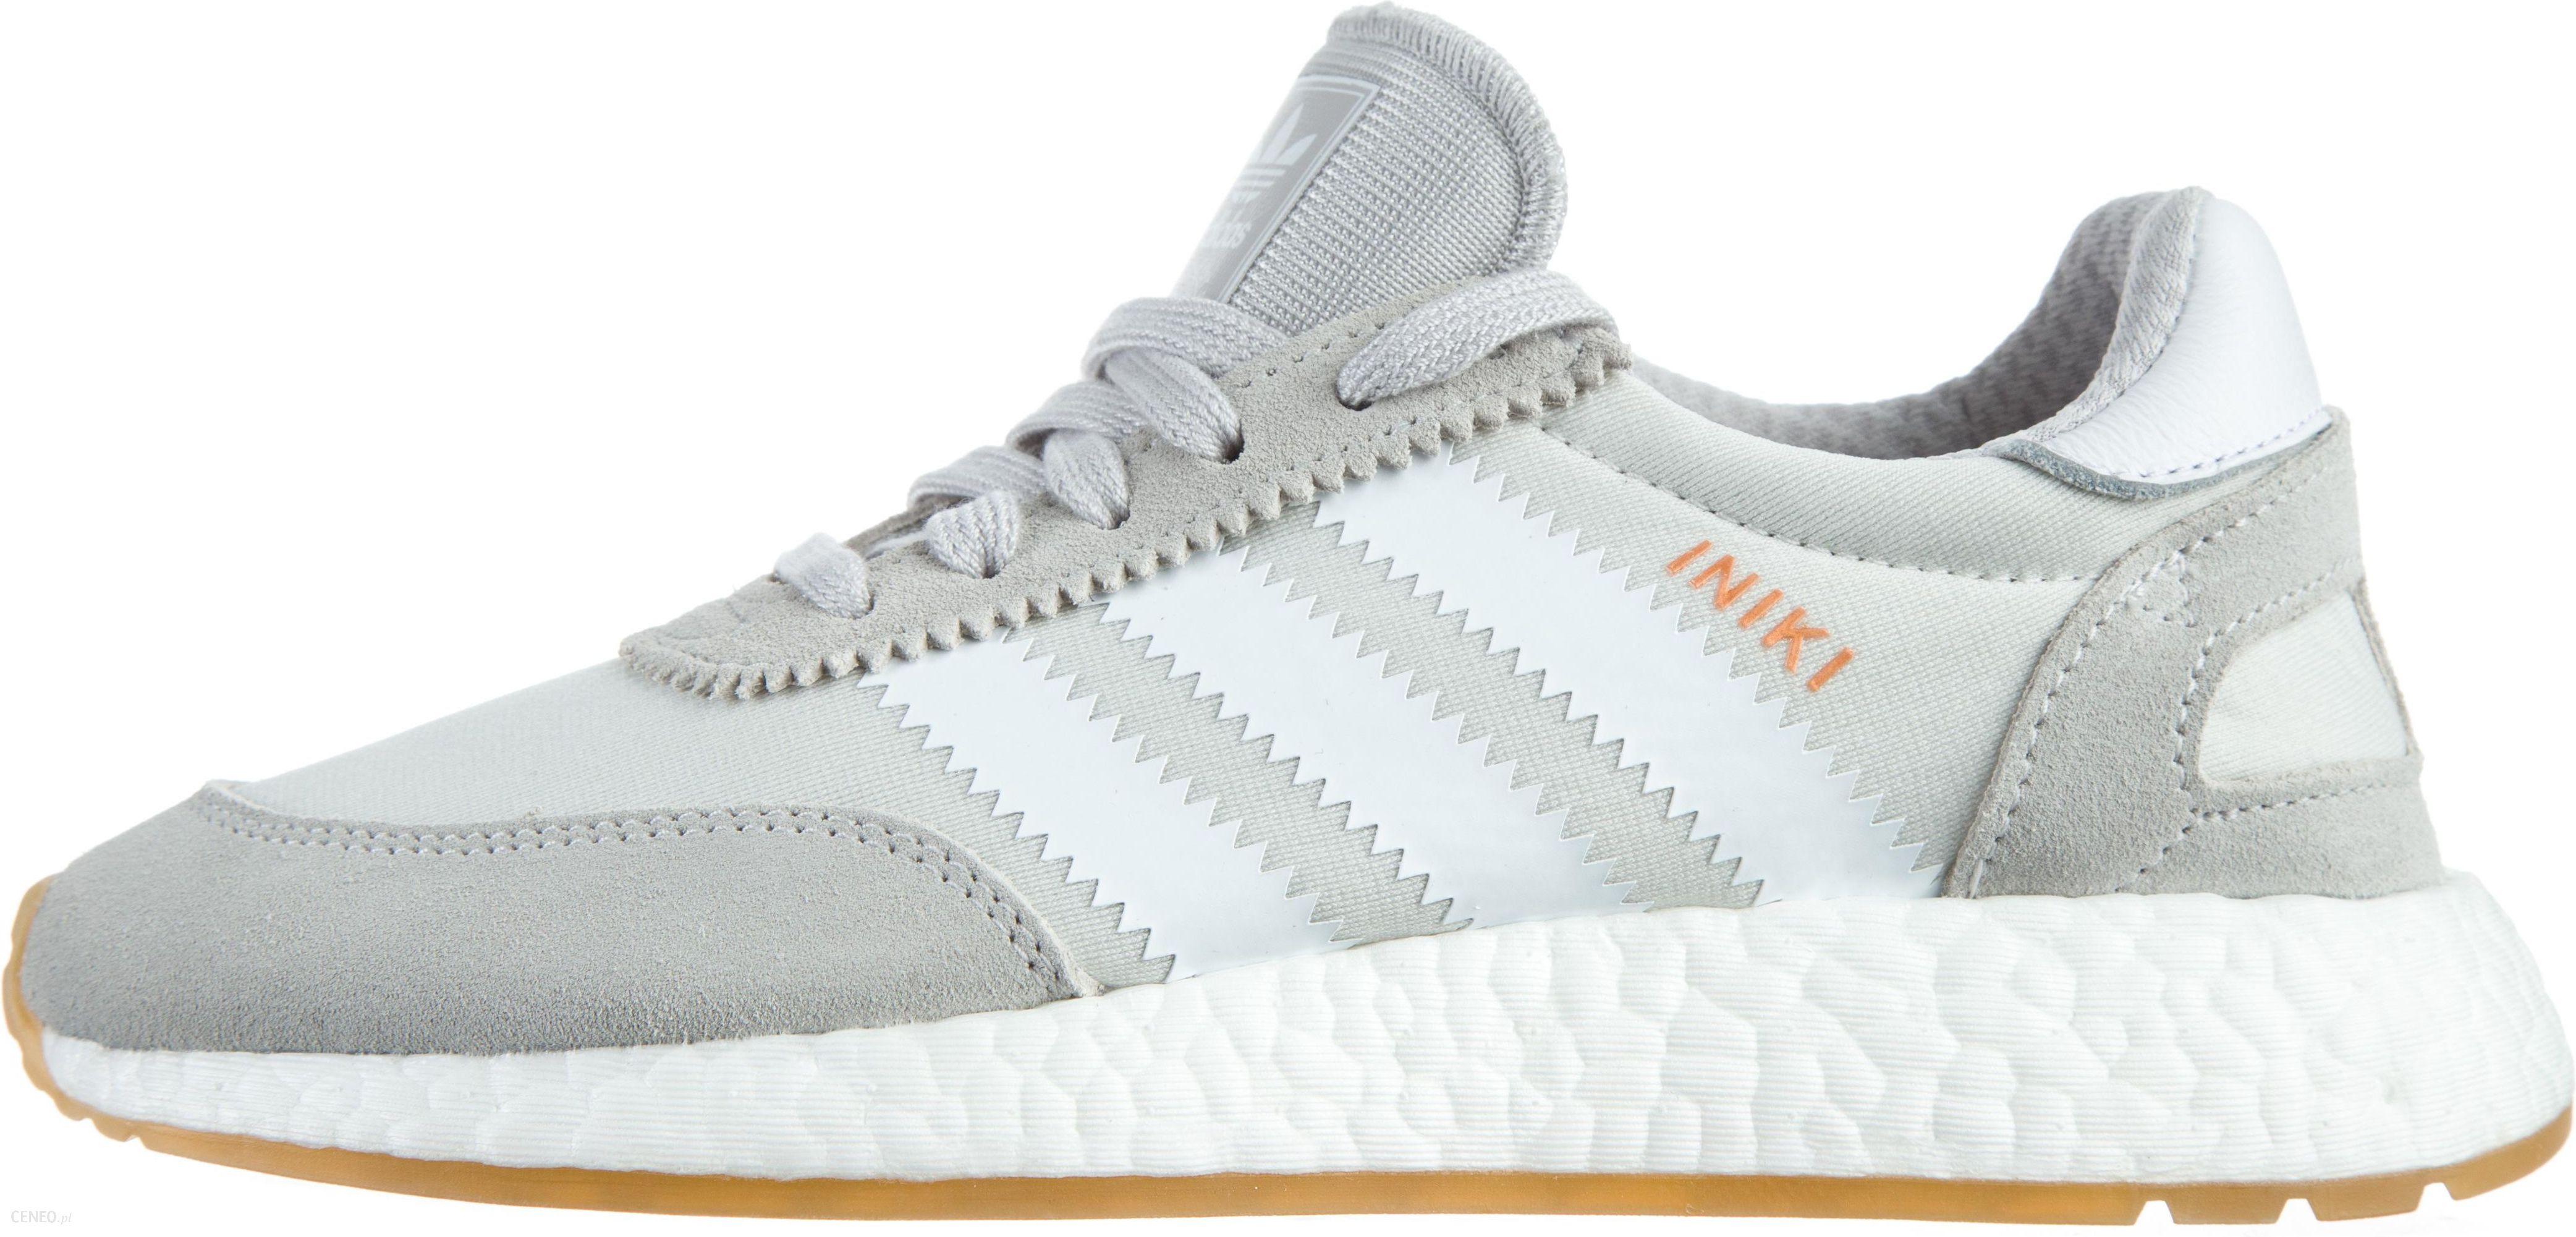 Buty sportowe damskie Adidas Originals Iniki 39 r